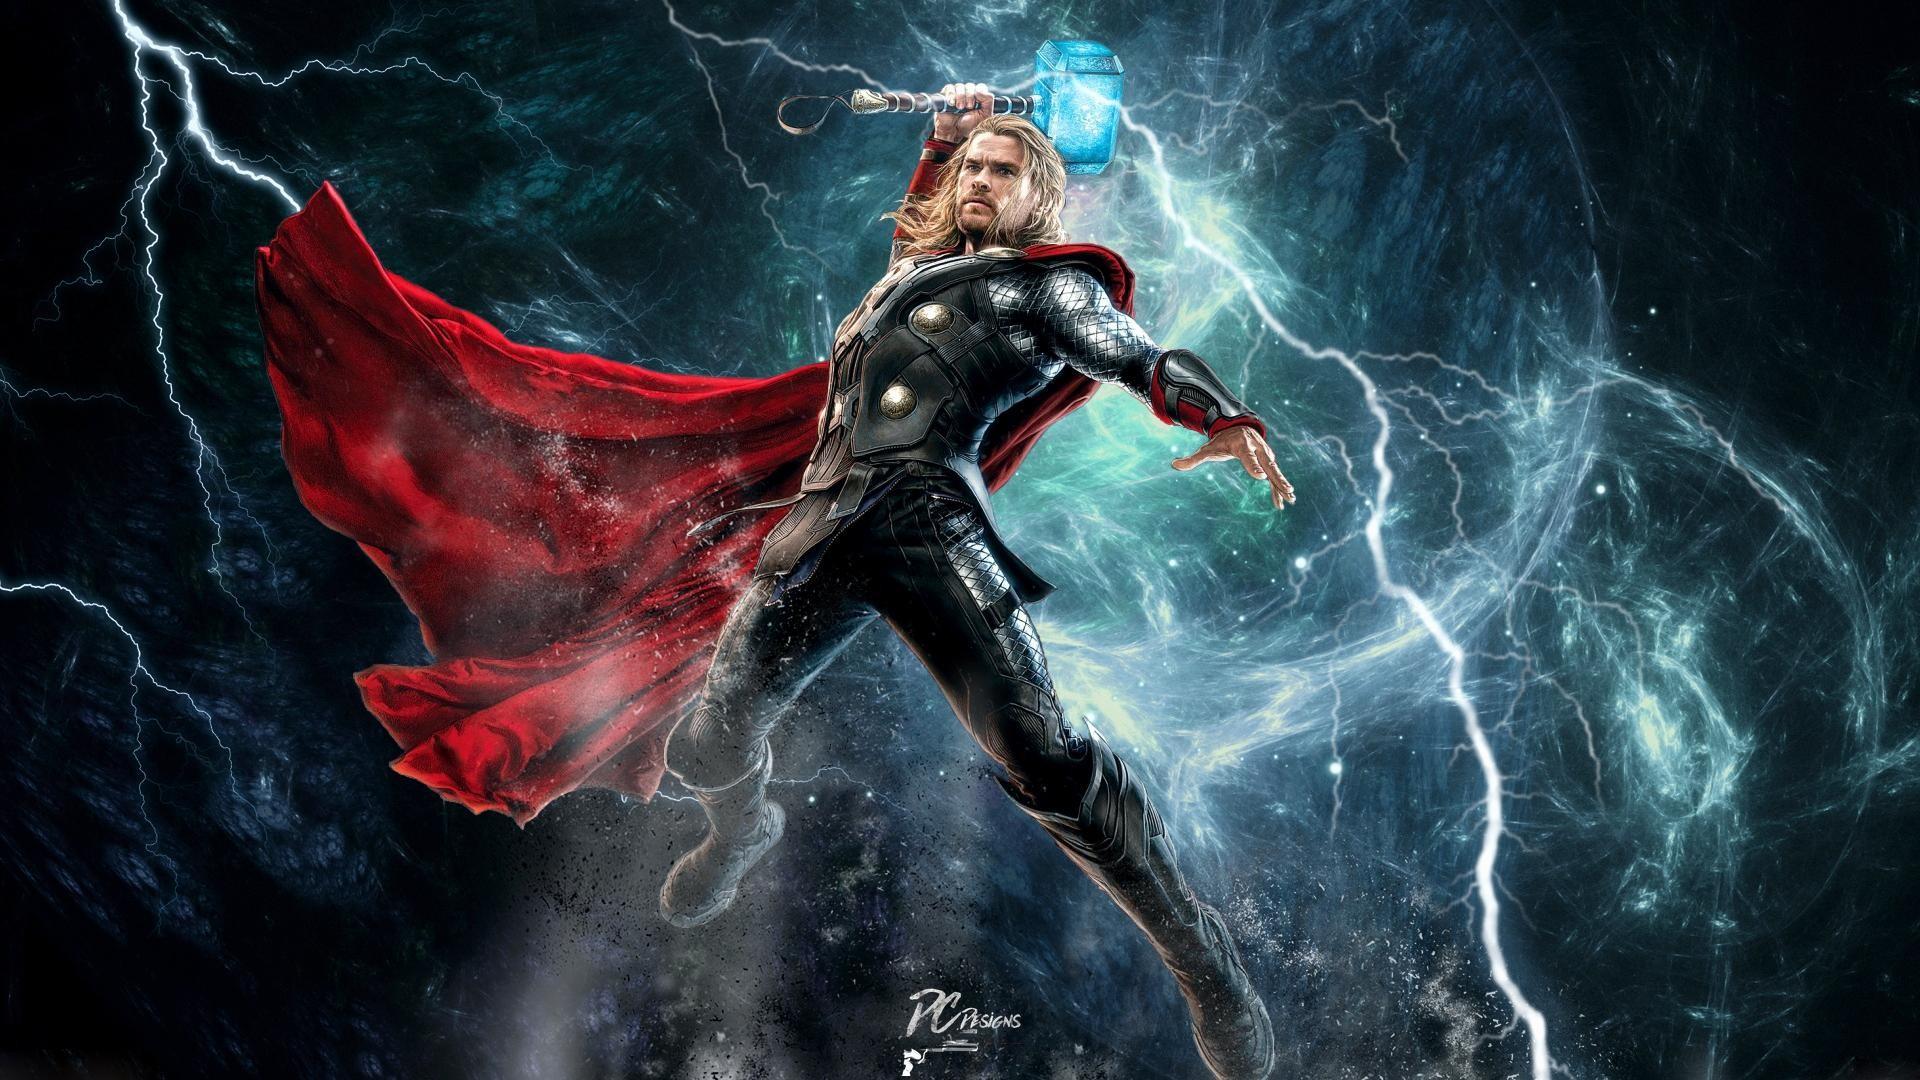 wallpaper.wiki-Thor-Wallpapers-HD-For-Desktop-PIC-